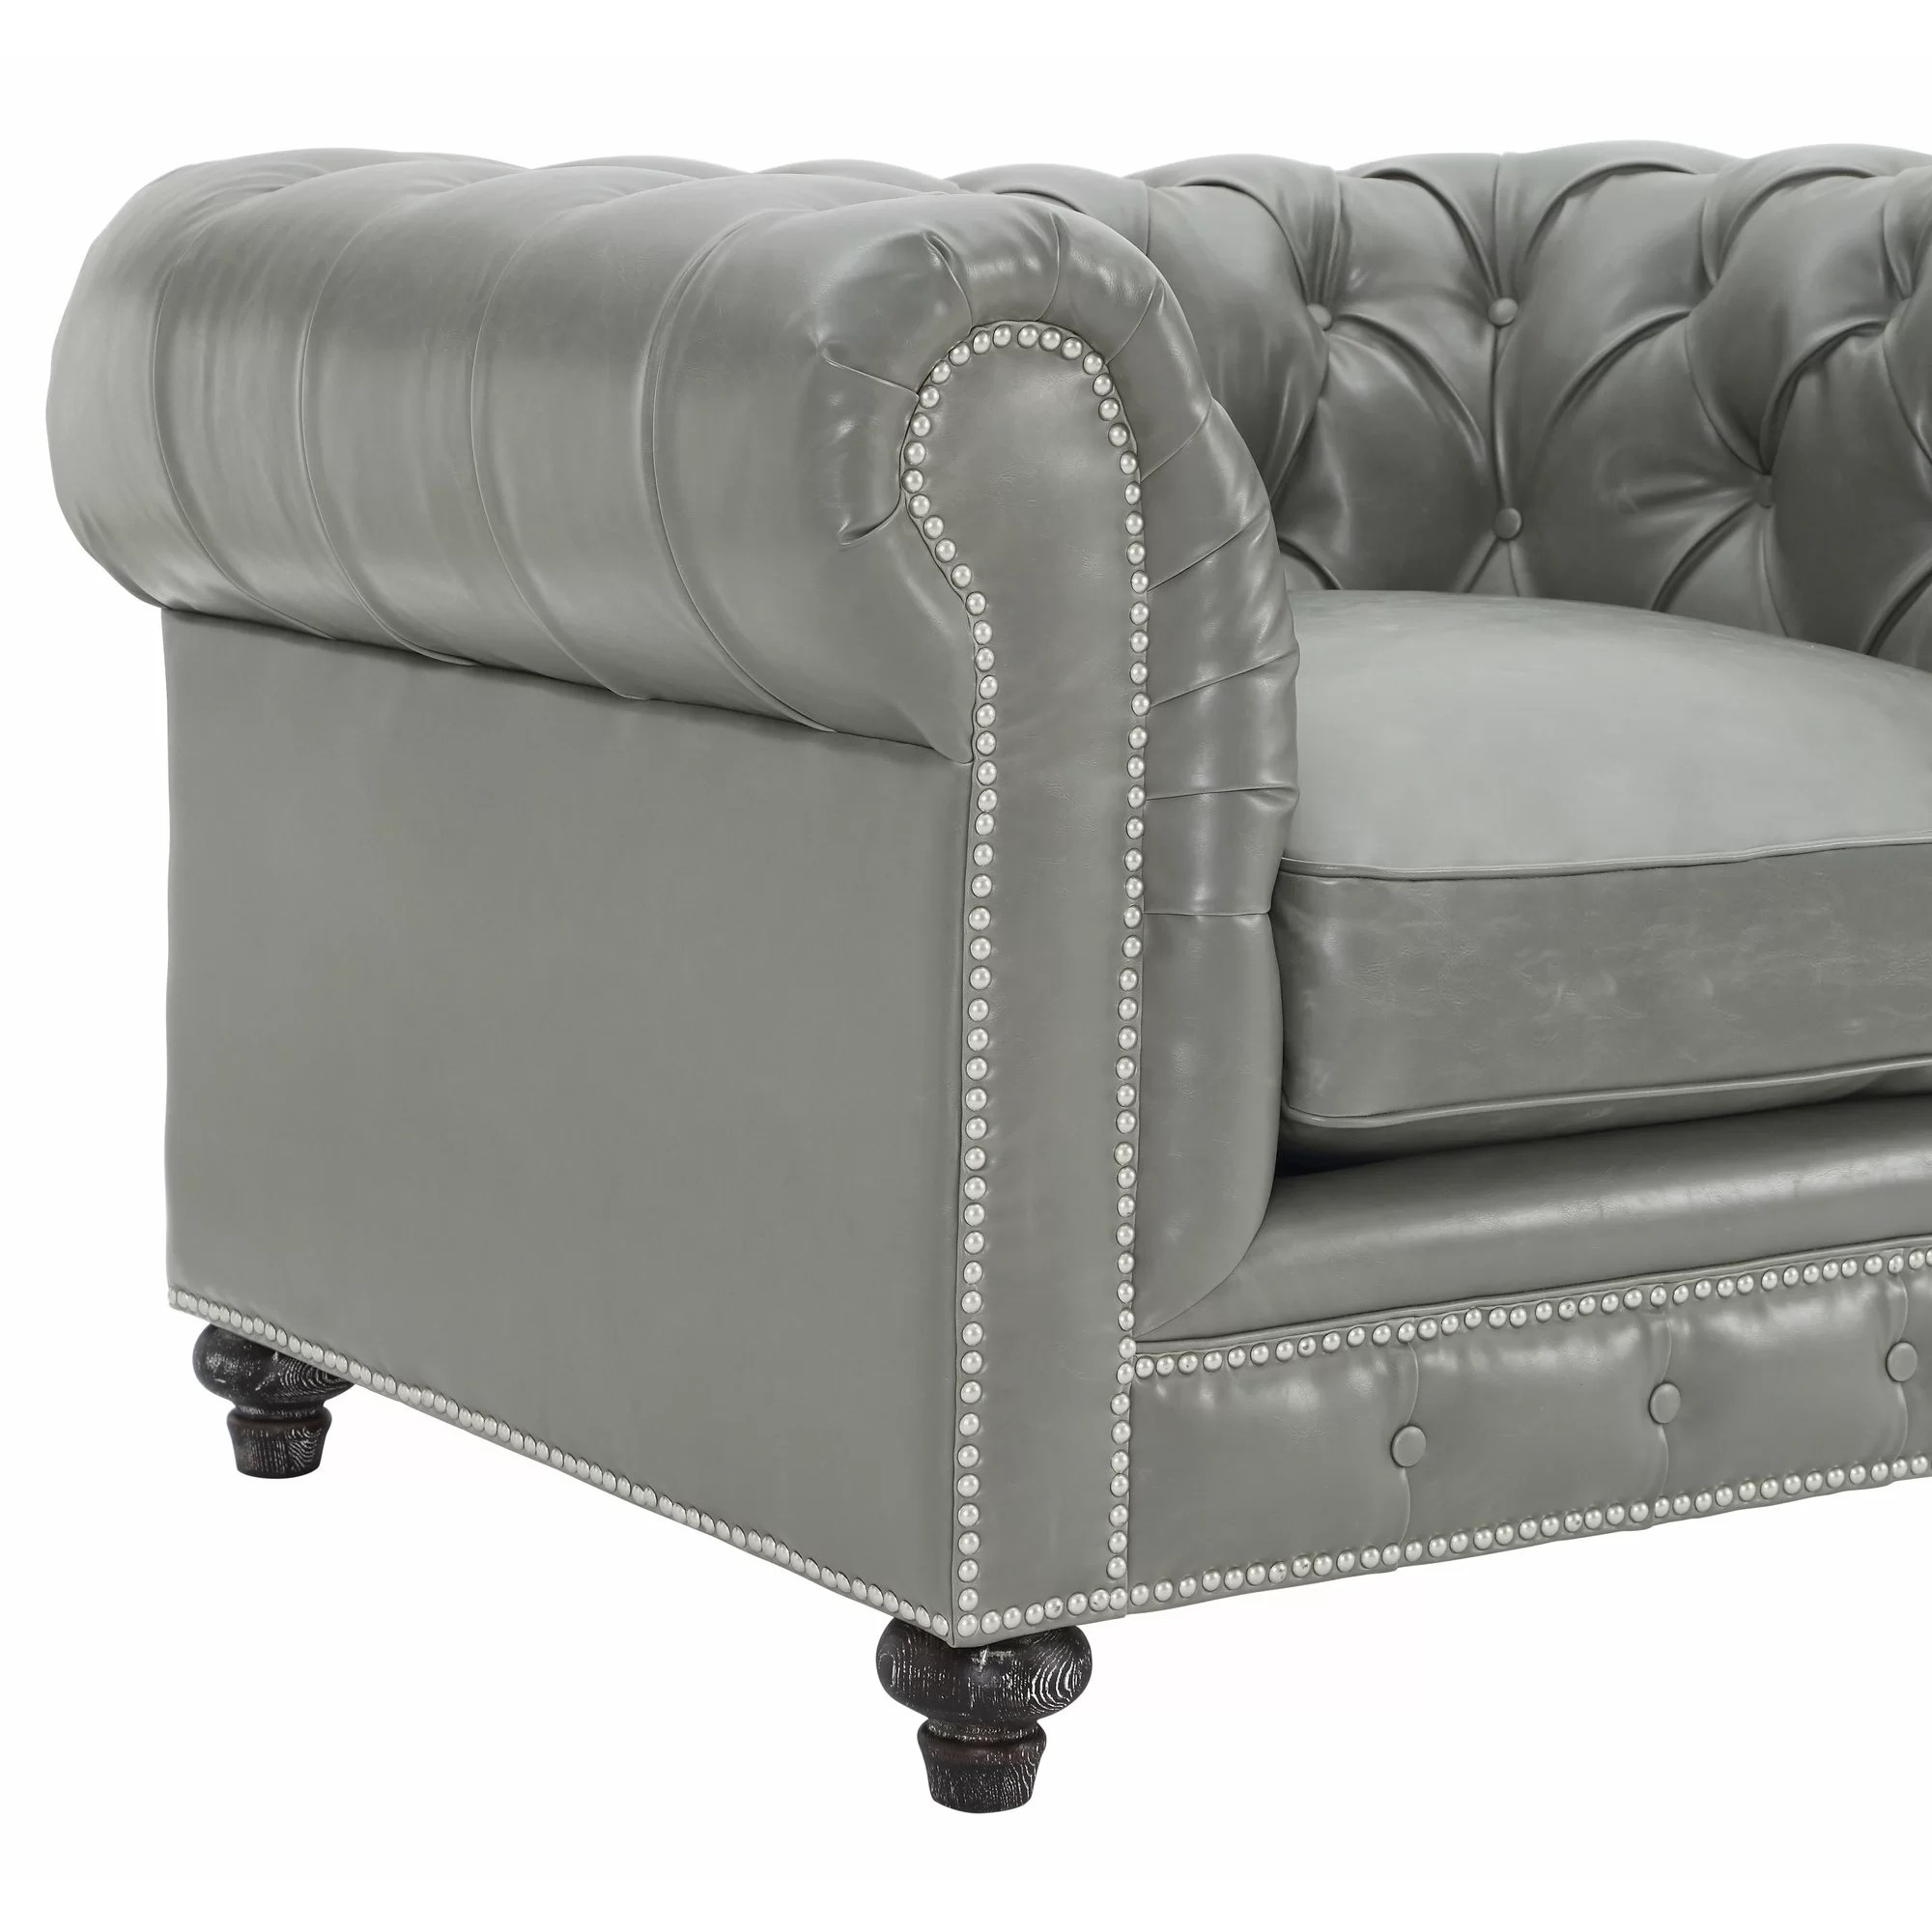 Mercer41 Bustam Leather Club Chair